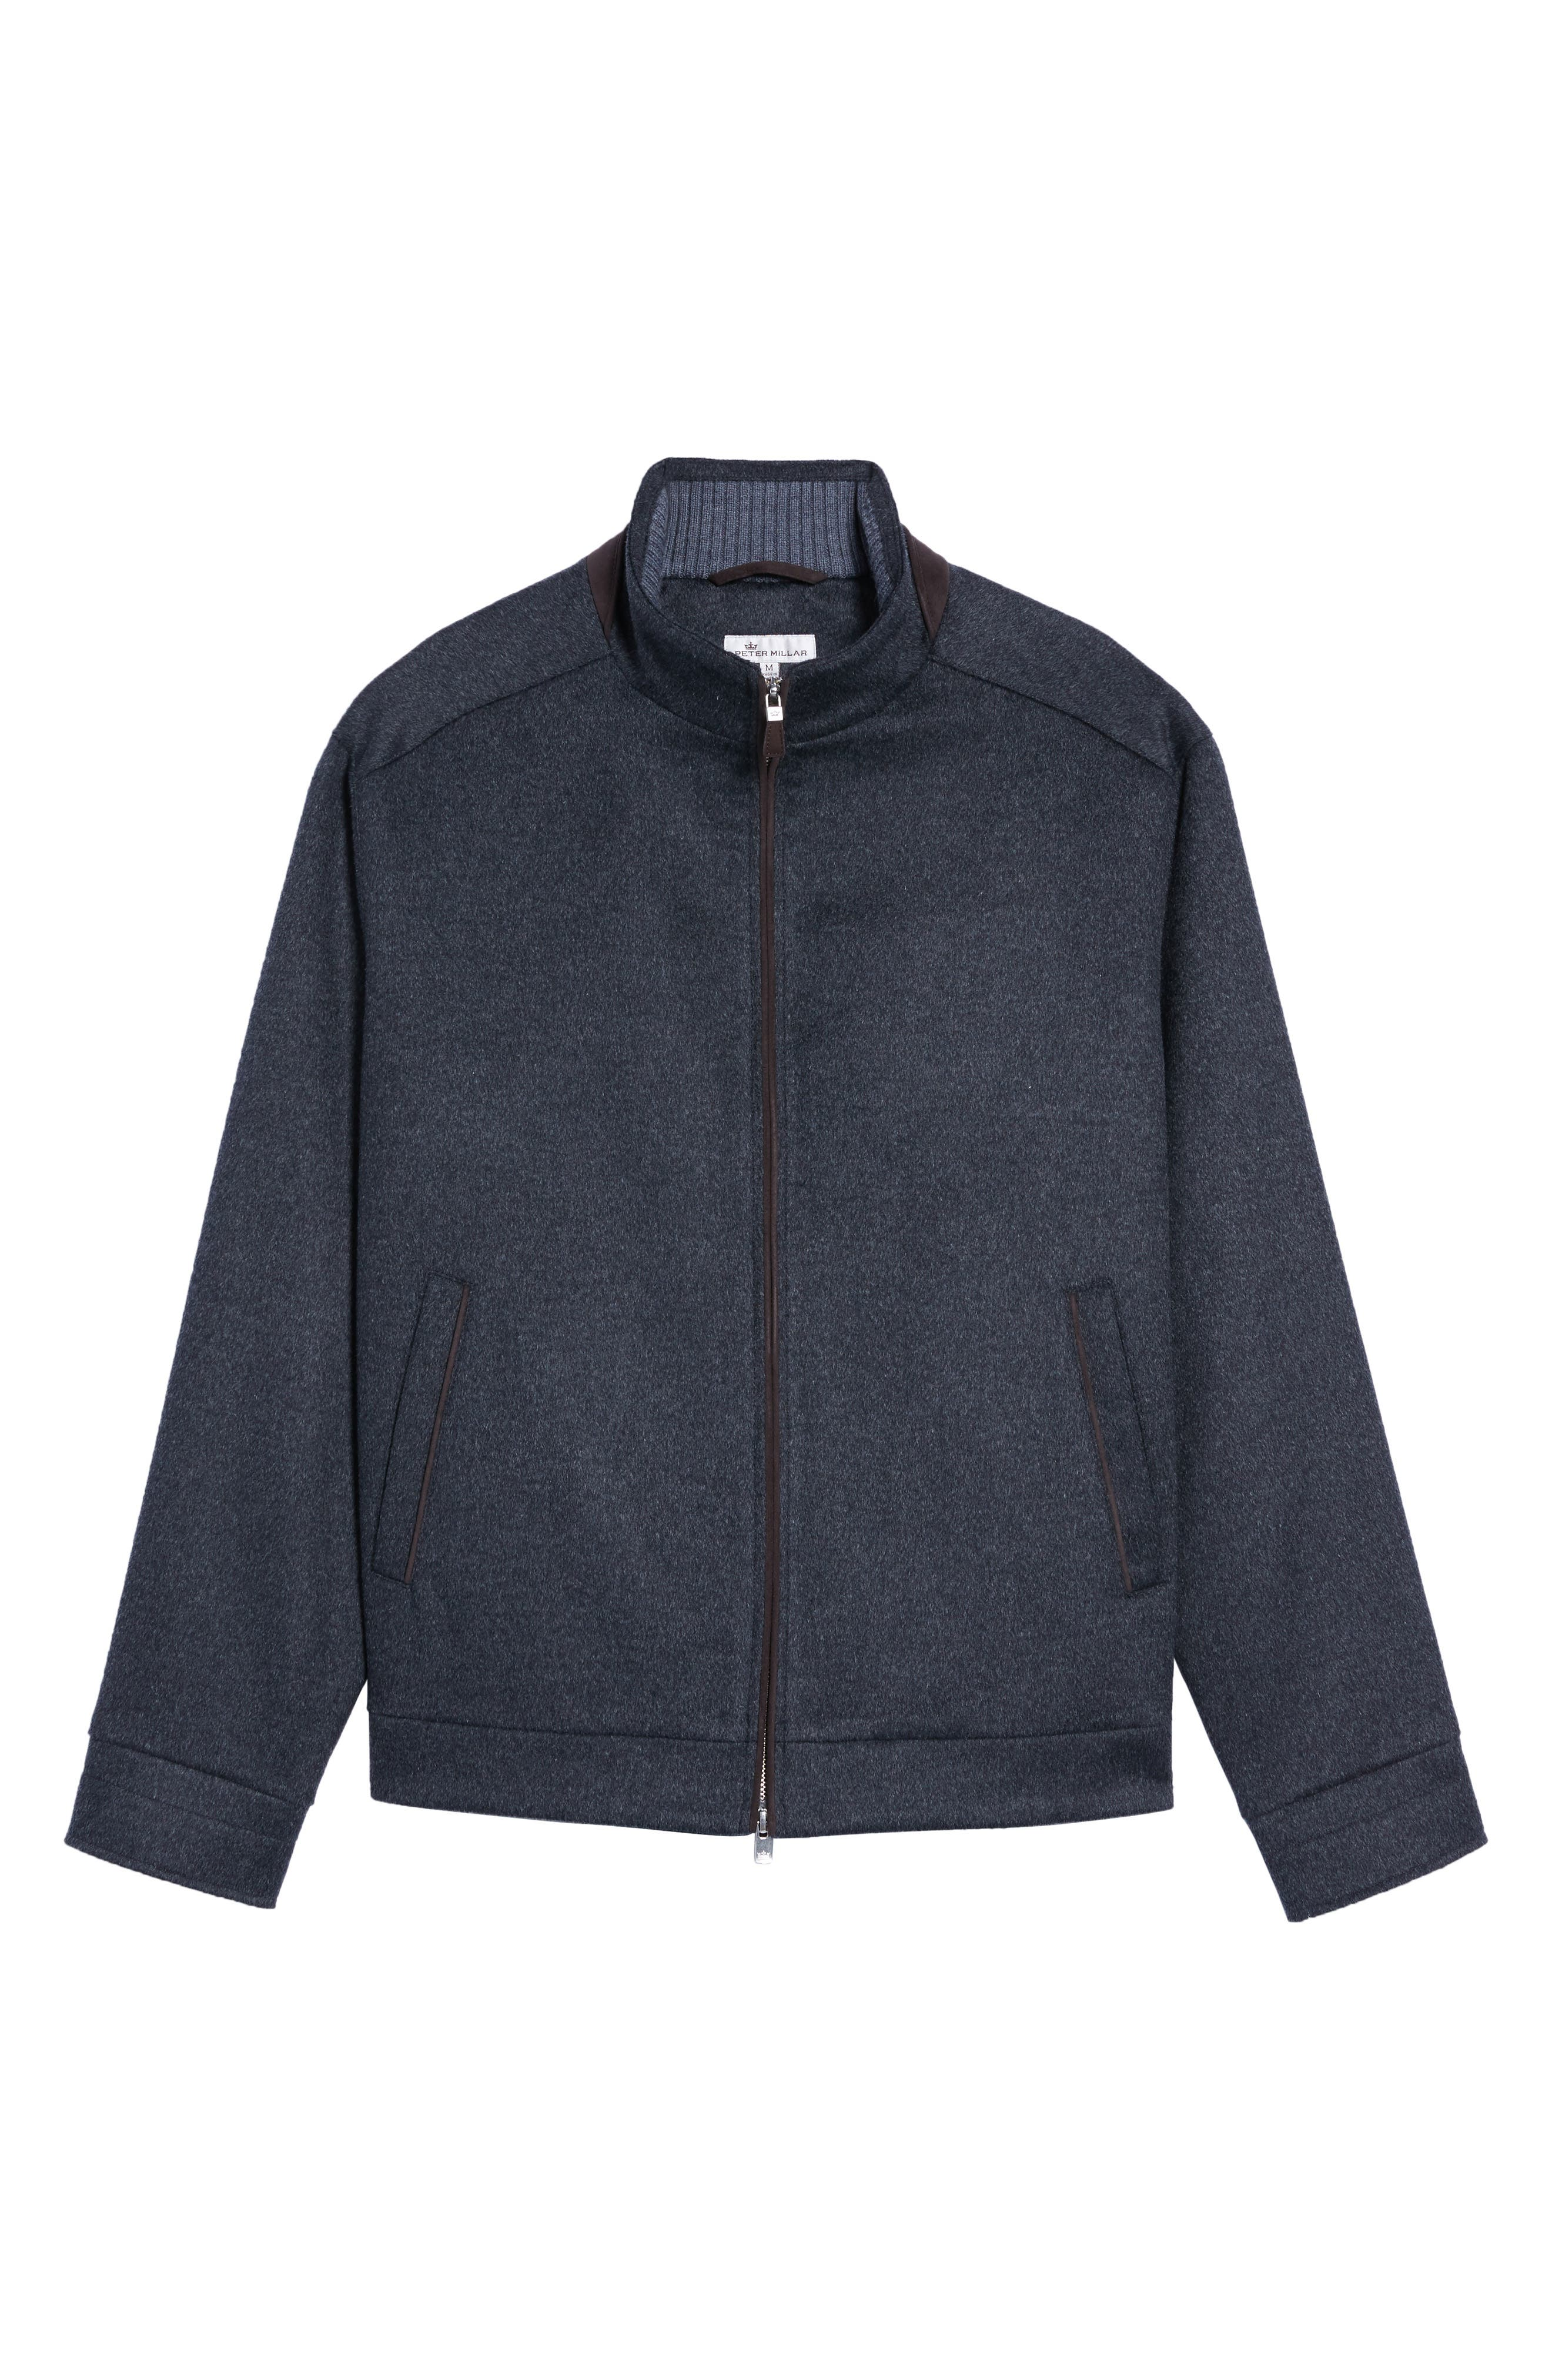 Westport Wool & Cashmere Jacket,                             Alternate thumbnail 14, color,